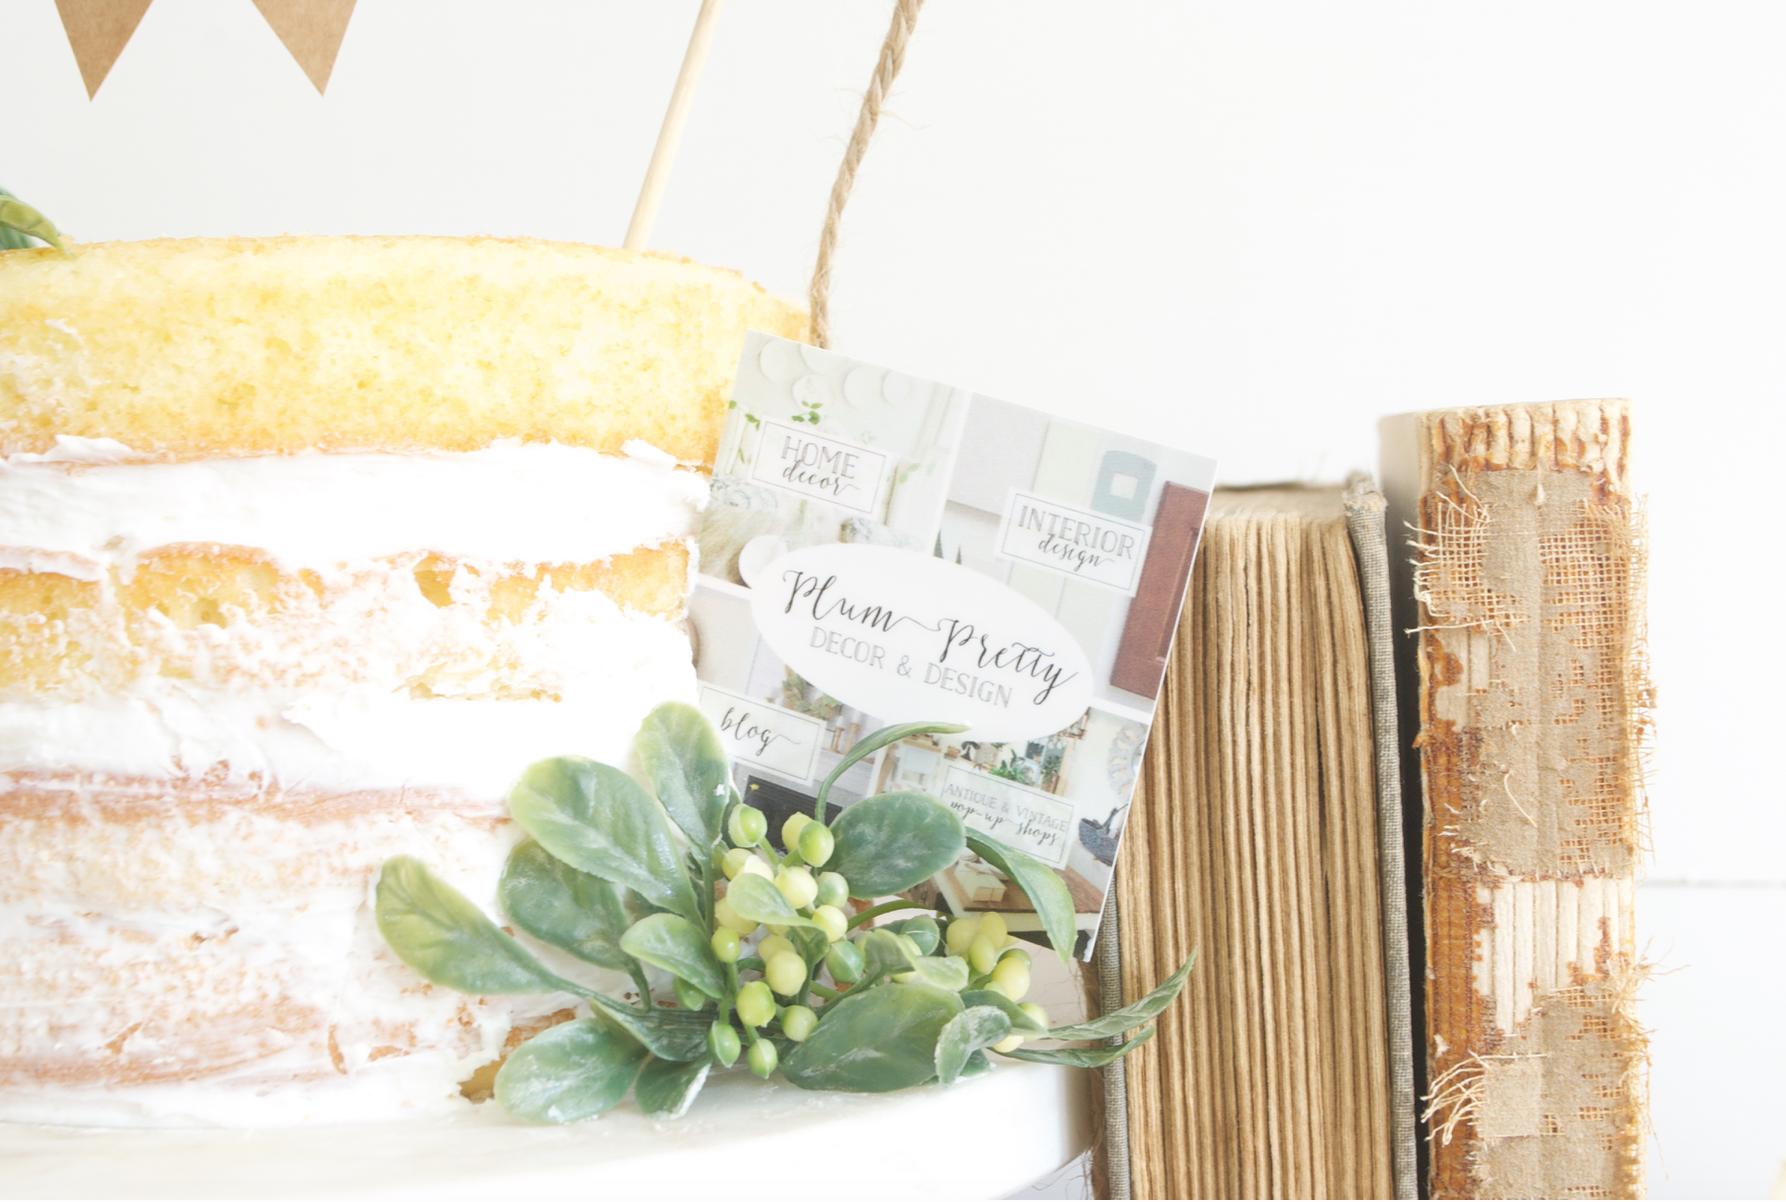 Plum Pretty Decor and Design Birthday Cake